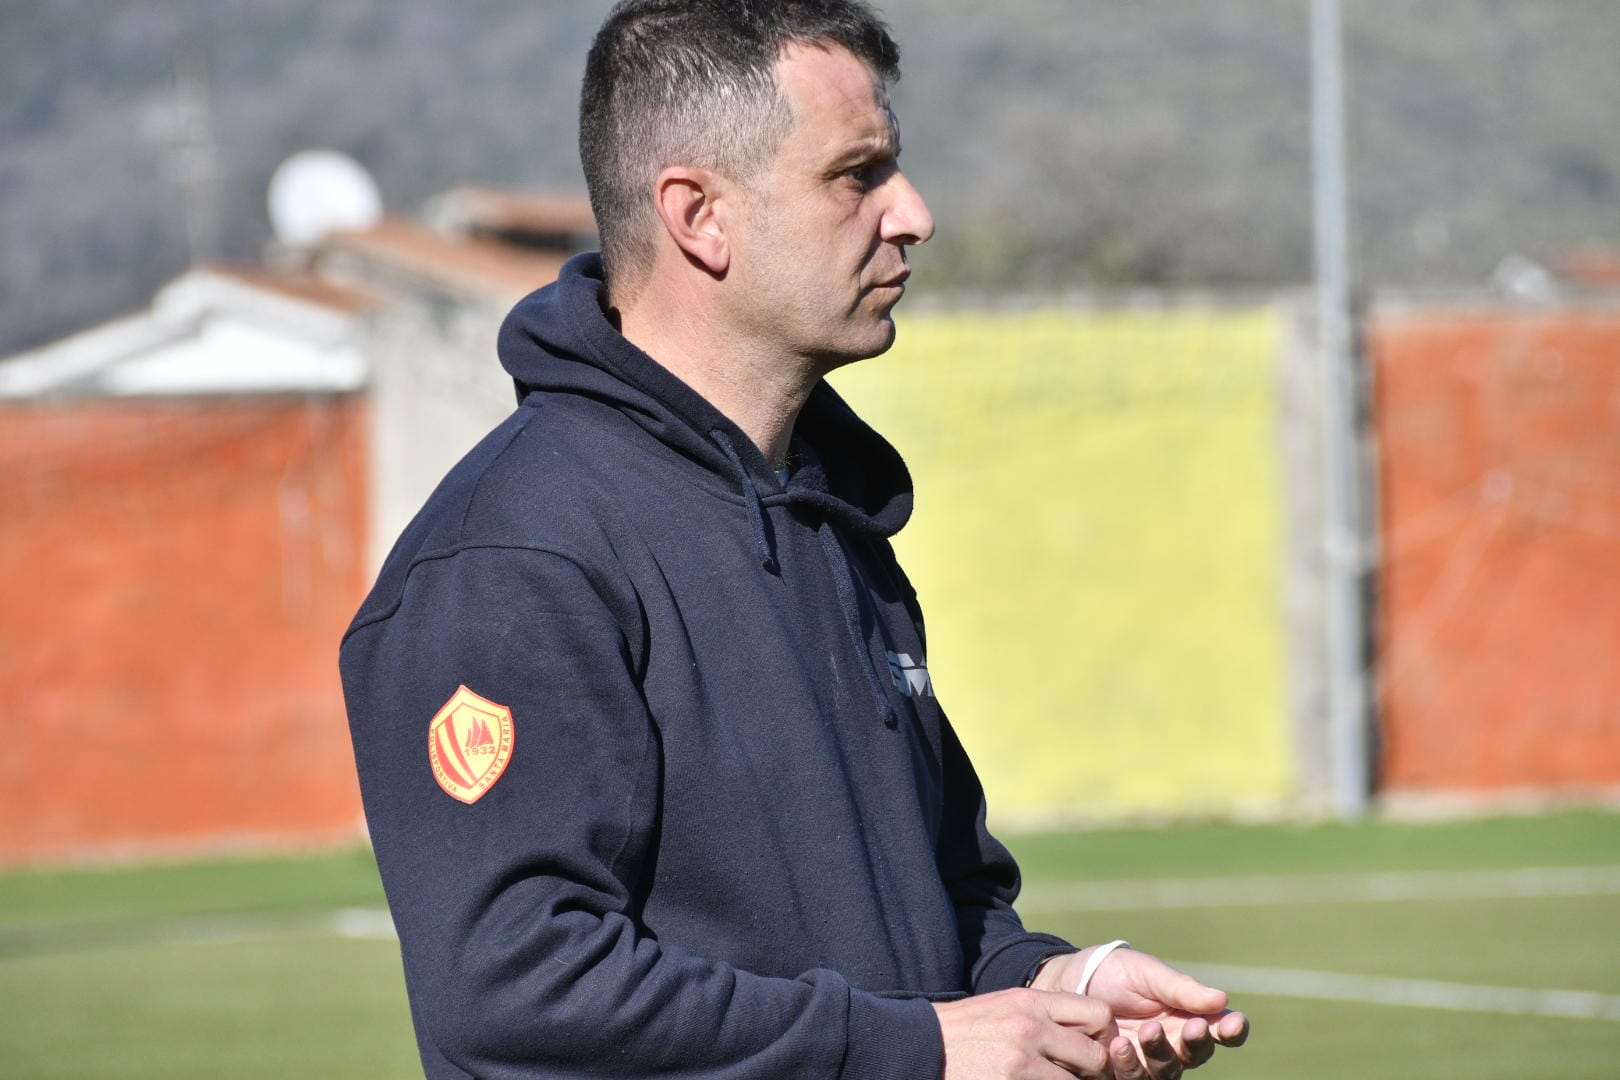 Polisportiva Santa Maria 0-1 Gelbison, post-gara con mister Esposito